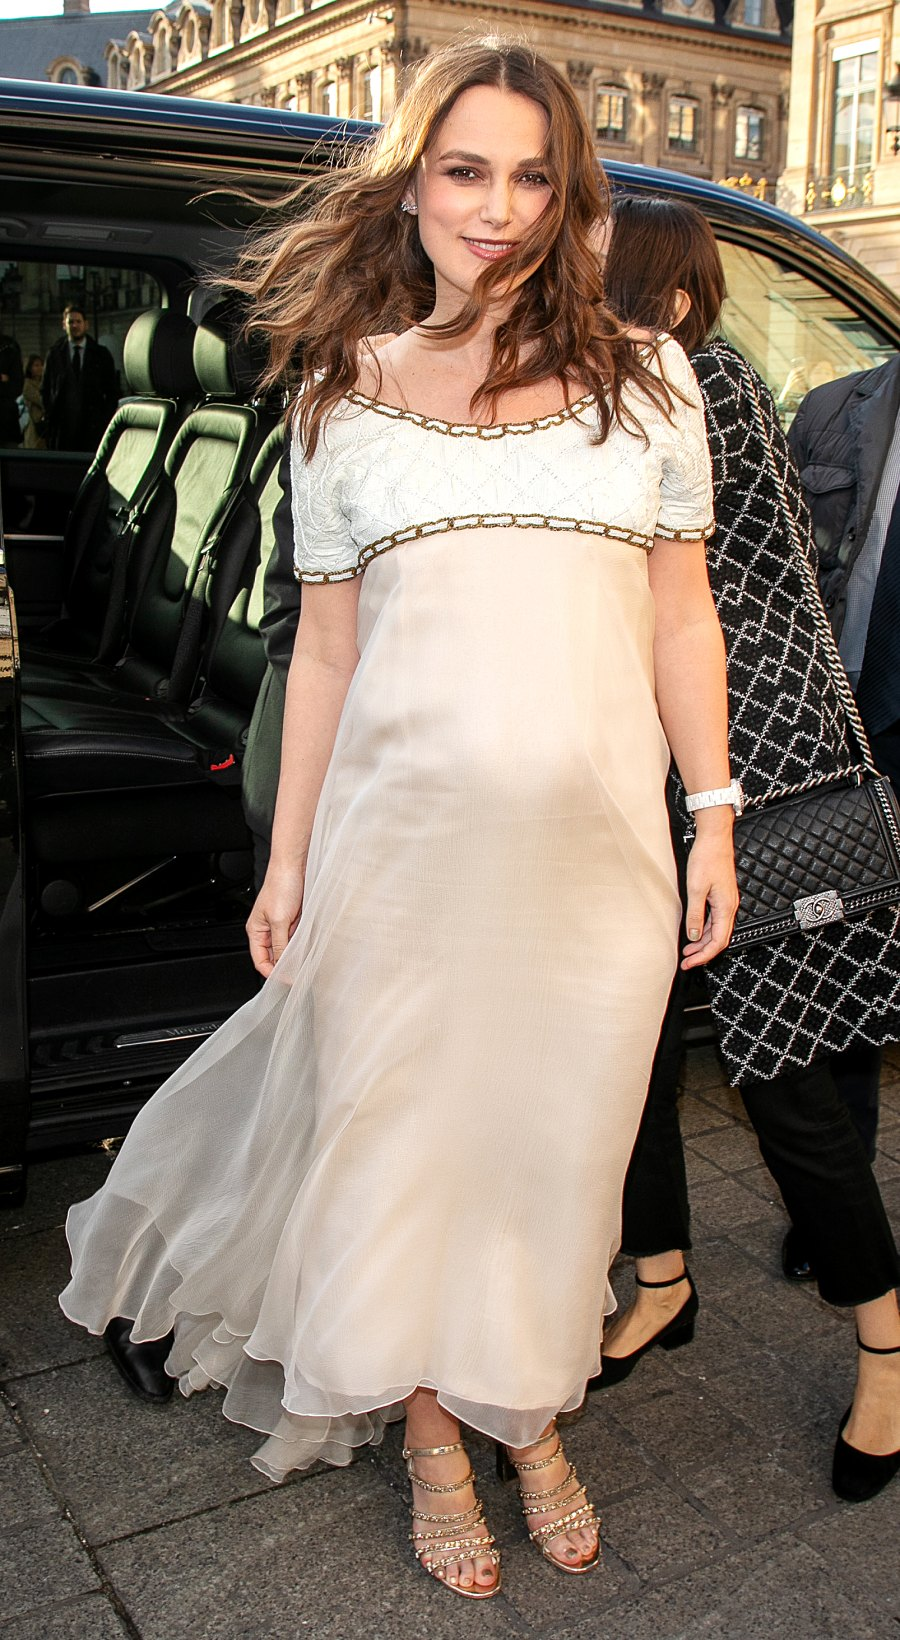 Keira Knightley Pregnant Baby 2